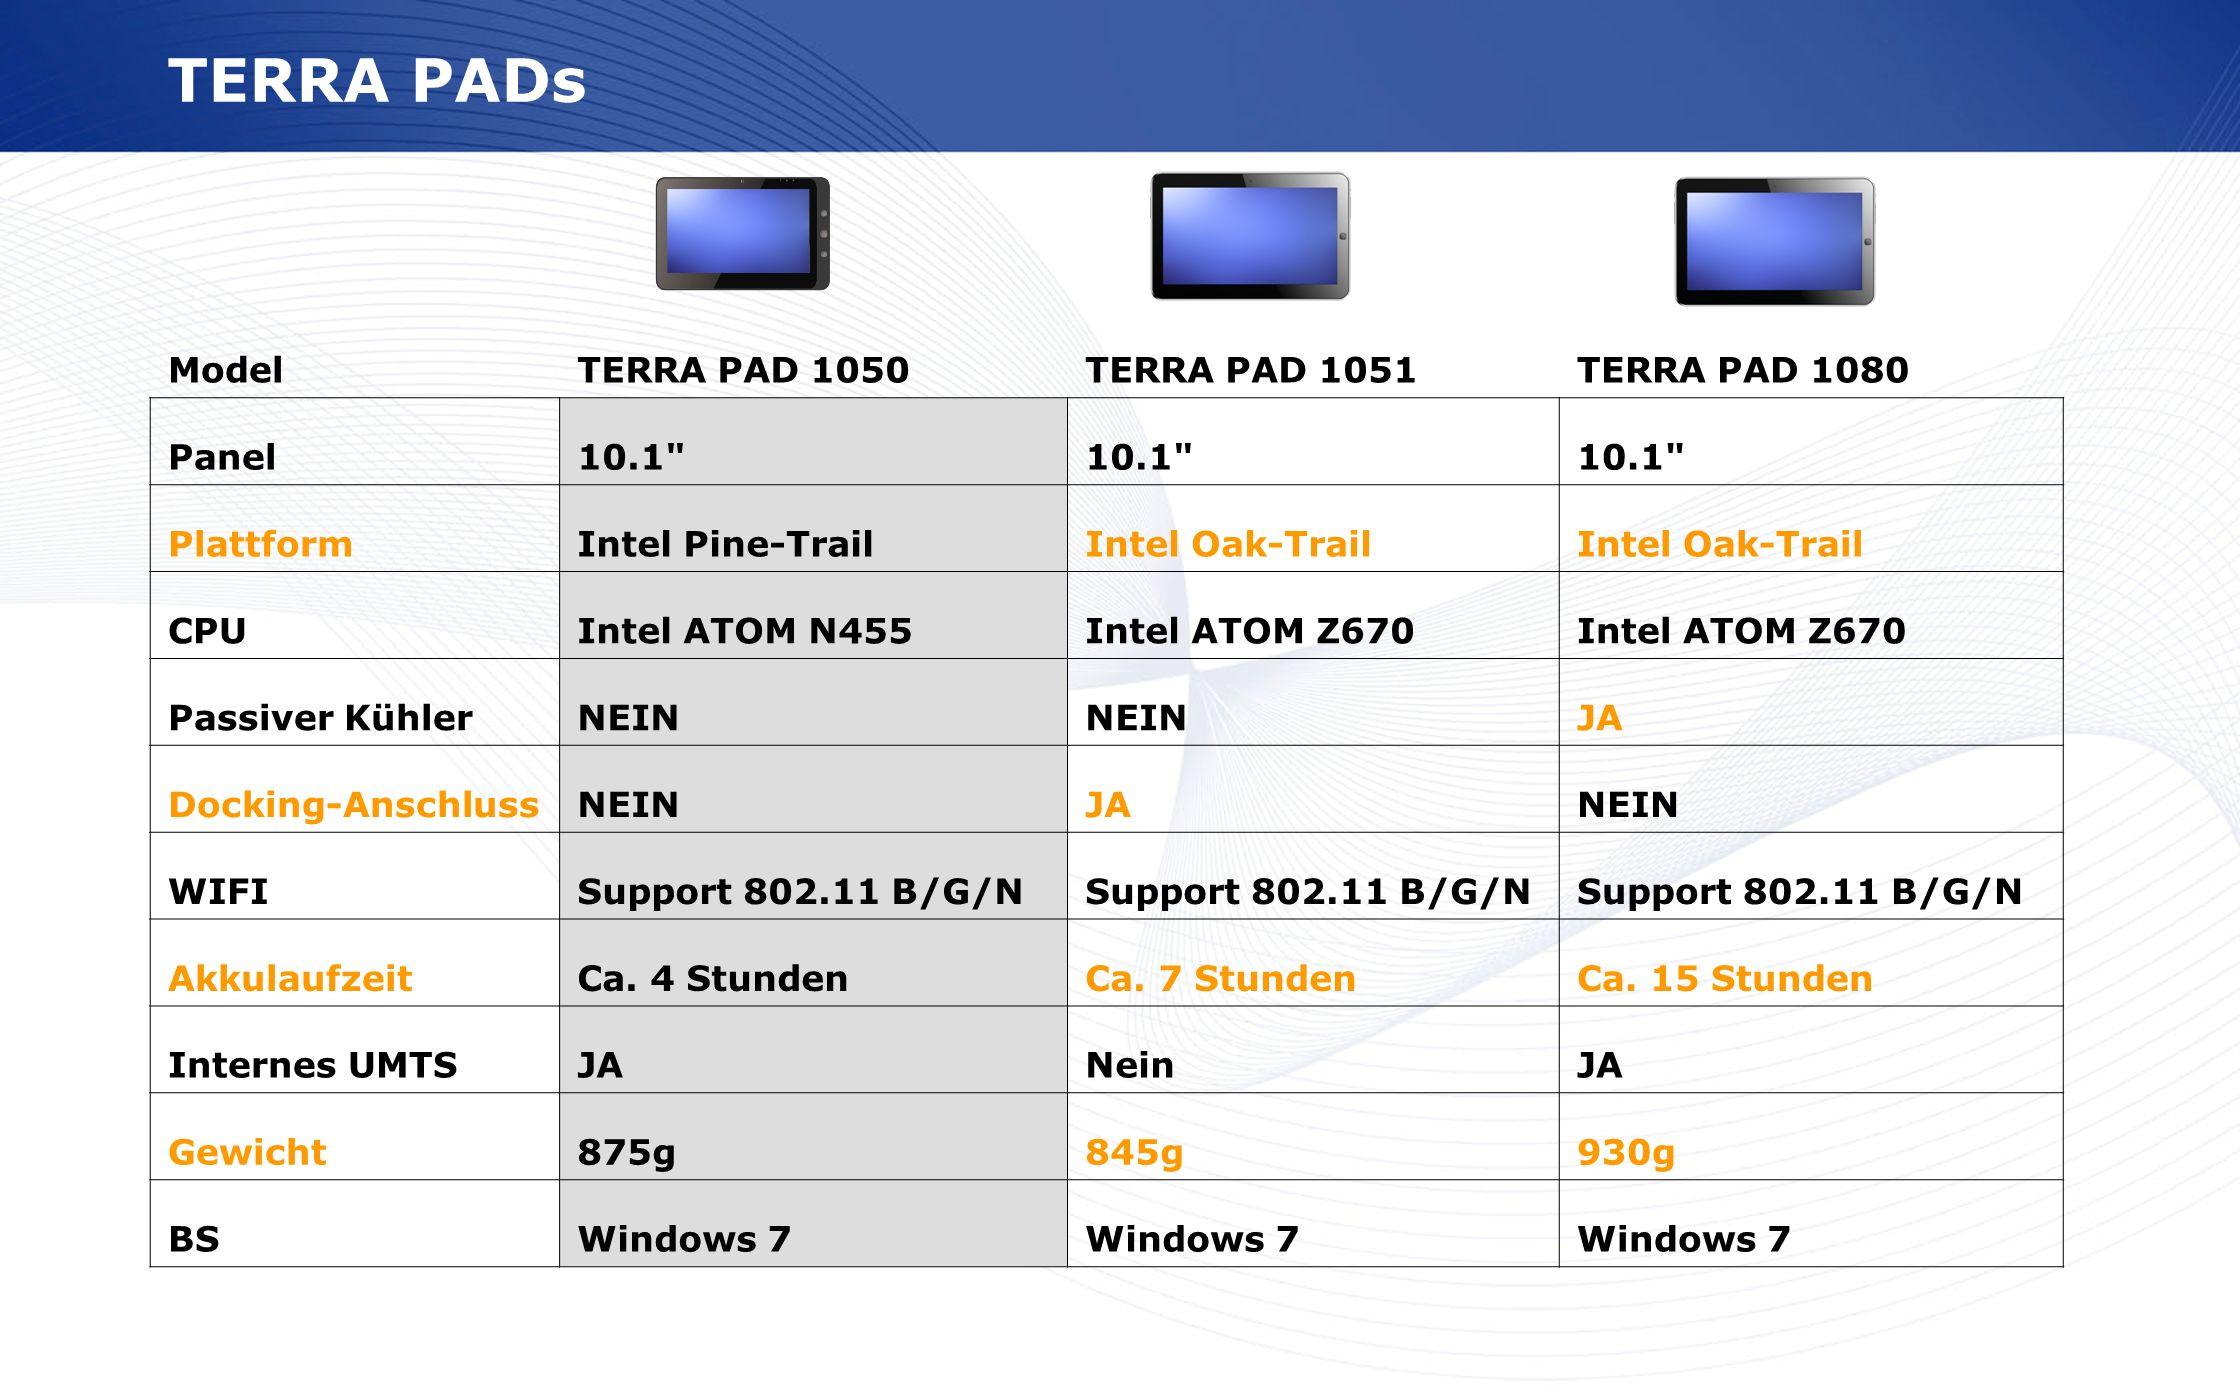 TERRA PADs Model TERRA PAD 1050 TERRA PAD 1051 TERRA PAD 1080 Panel